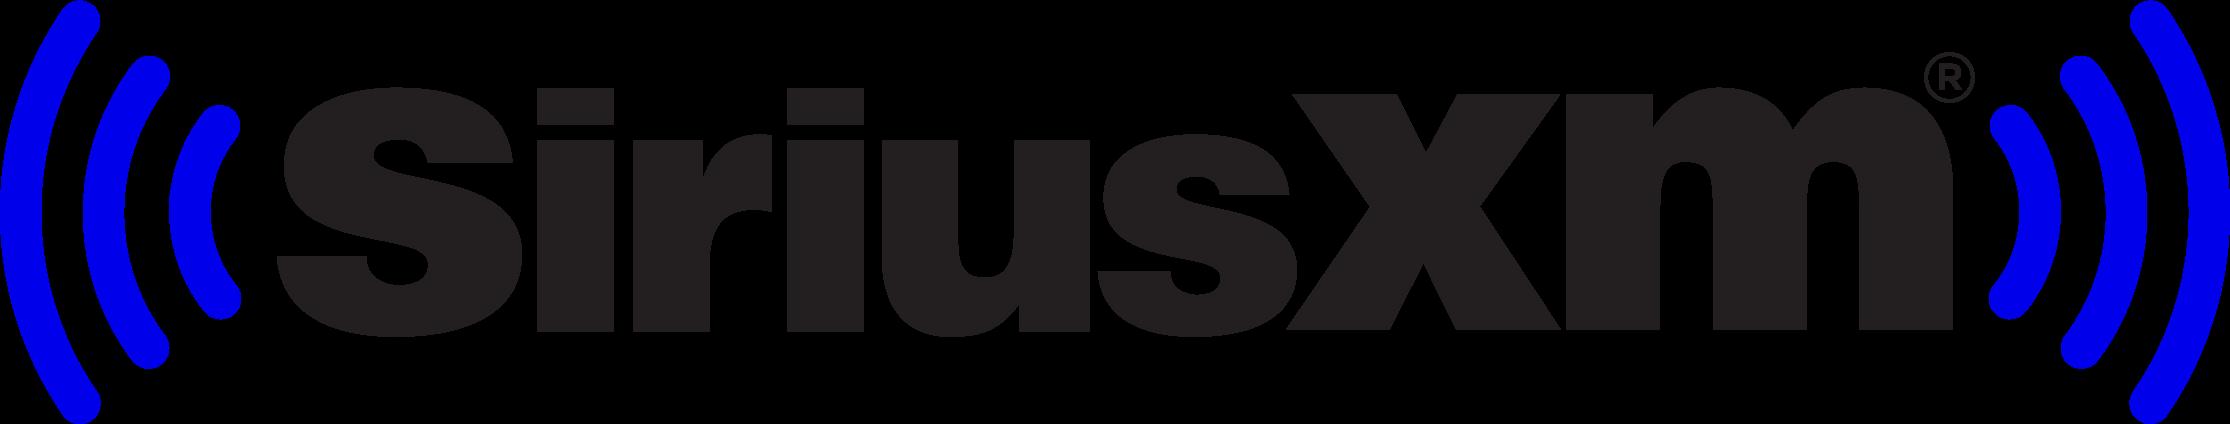 Sirius Xm Christmas Station.Siriusxm To Launch Holiday Music Channels